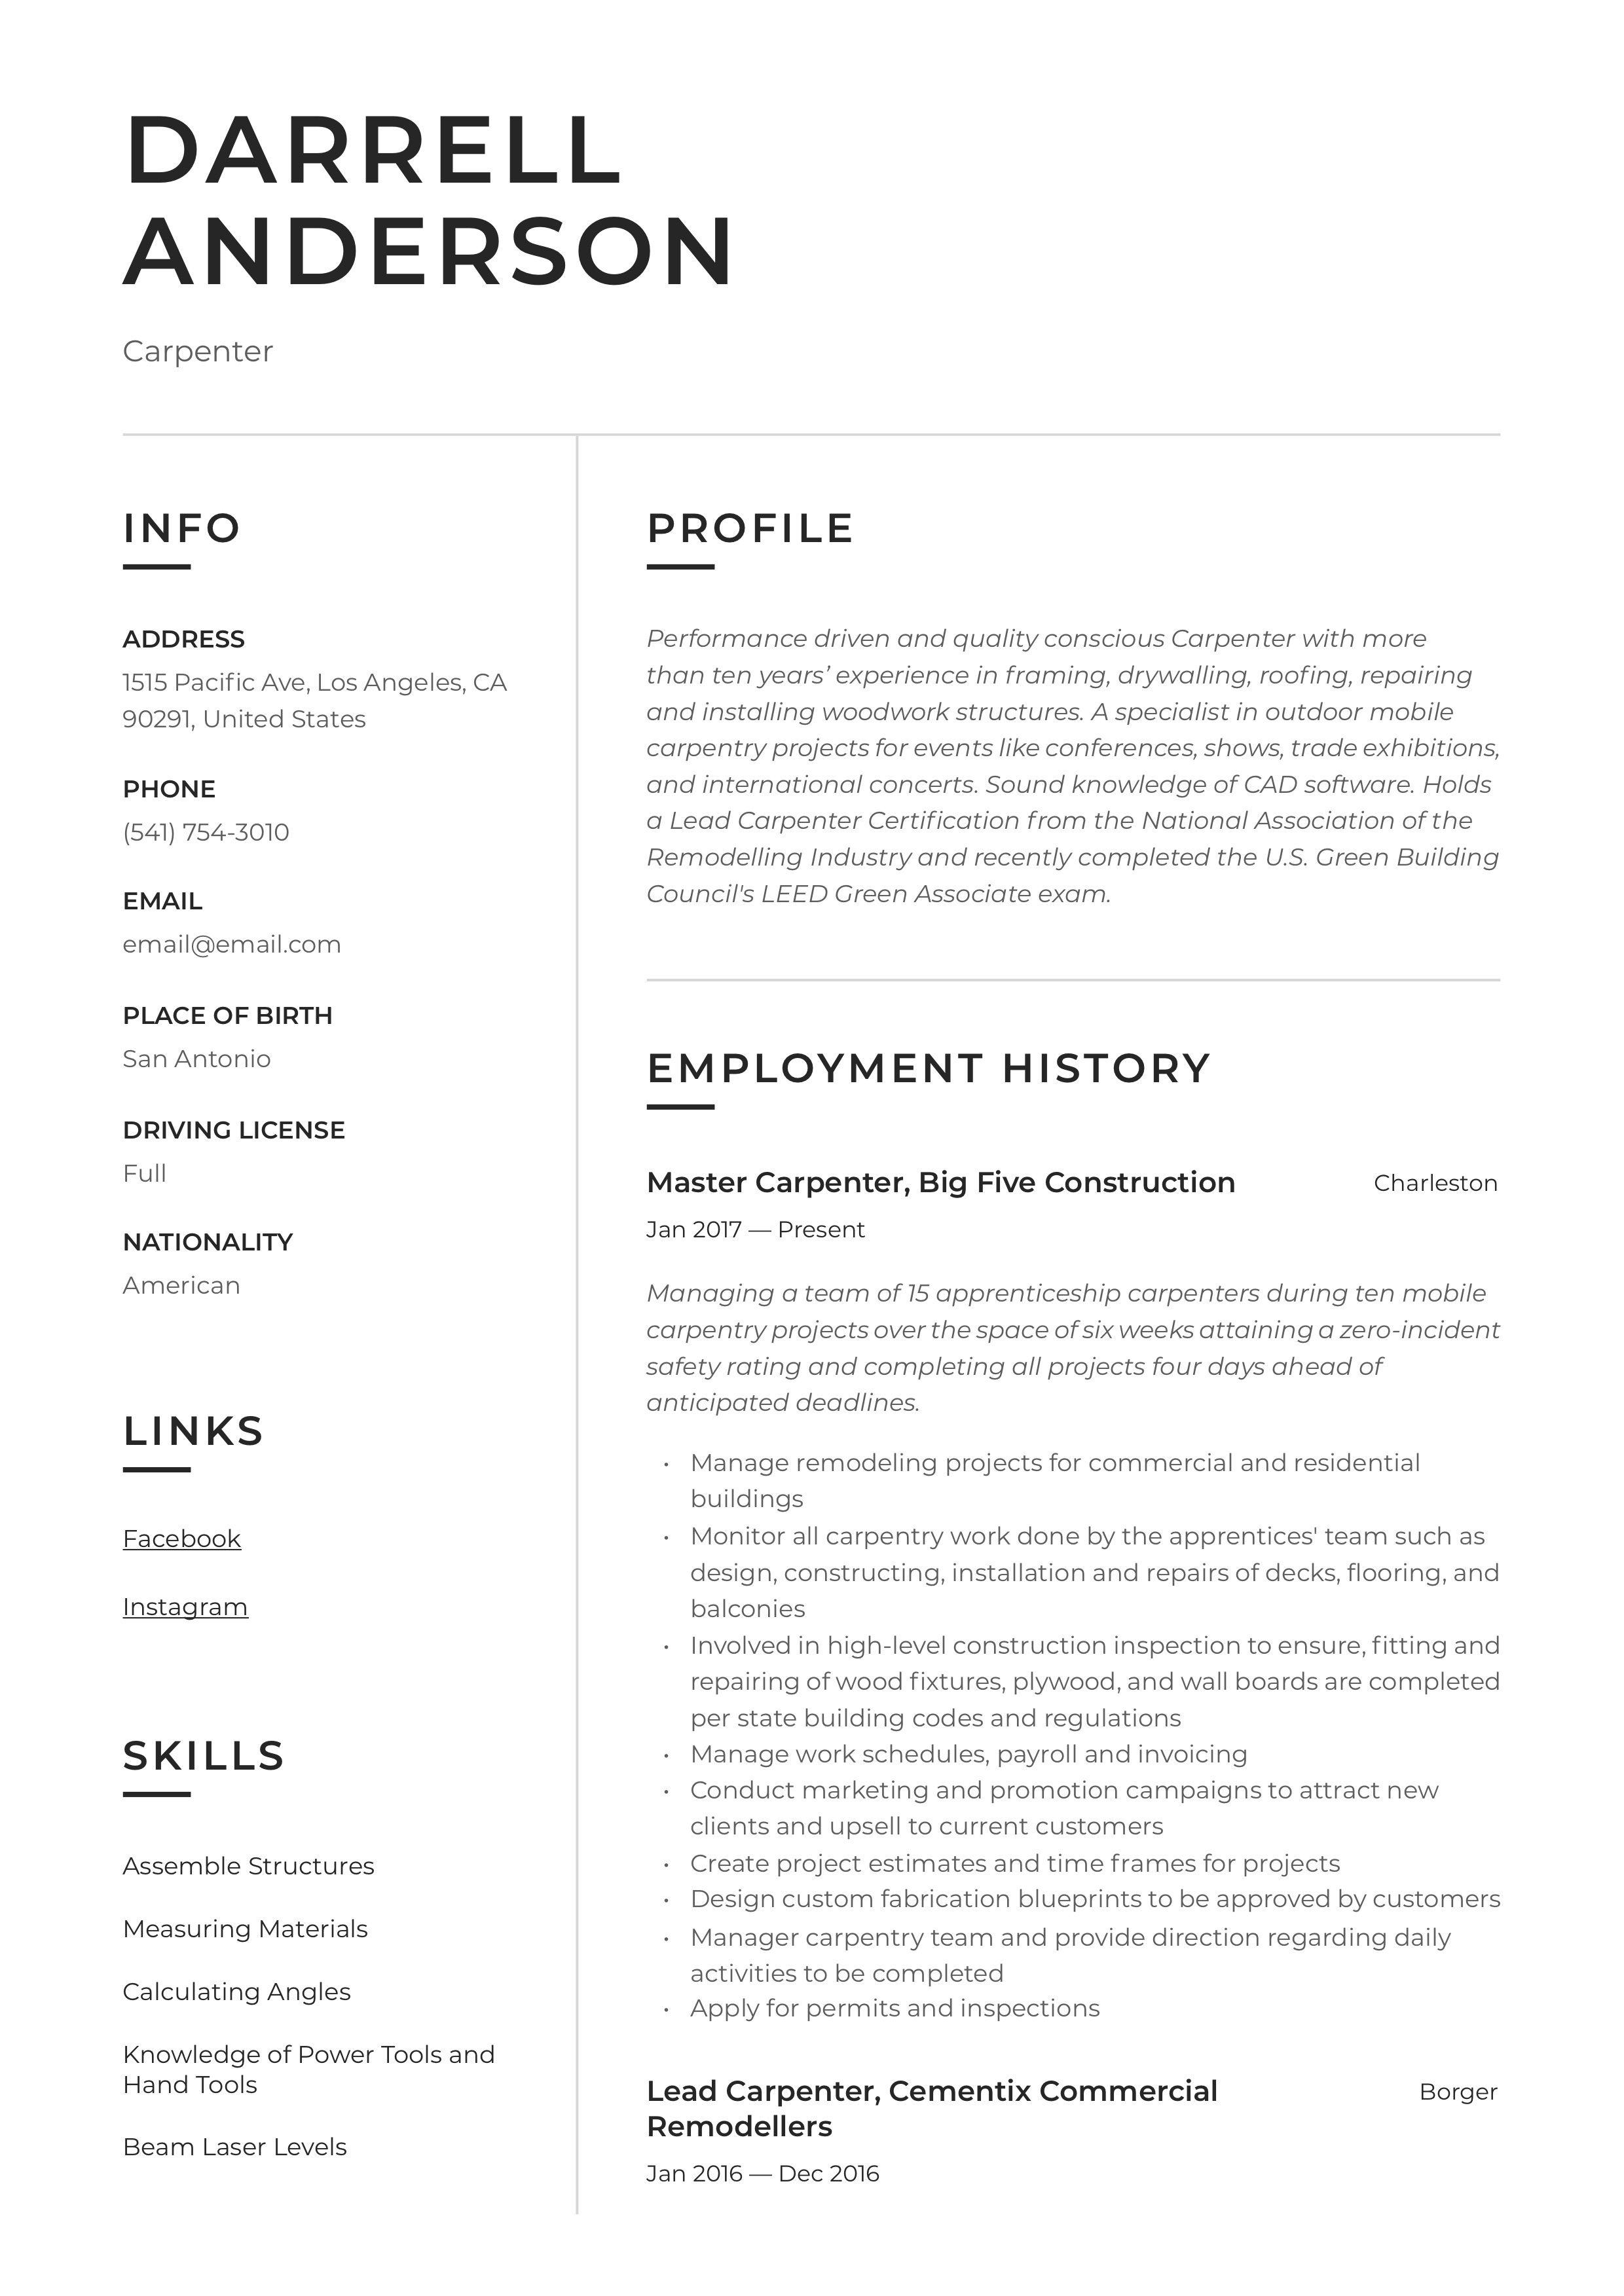 Carpenter resume sample in 2020 resume examples resume